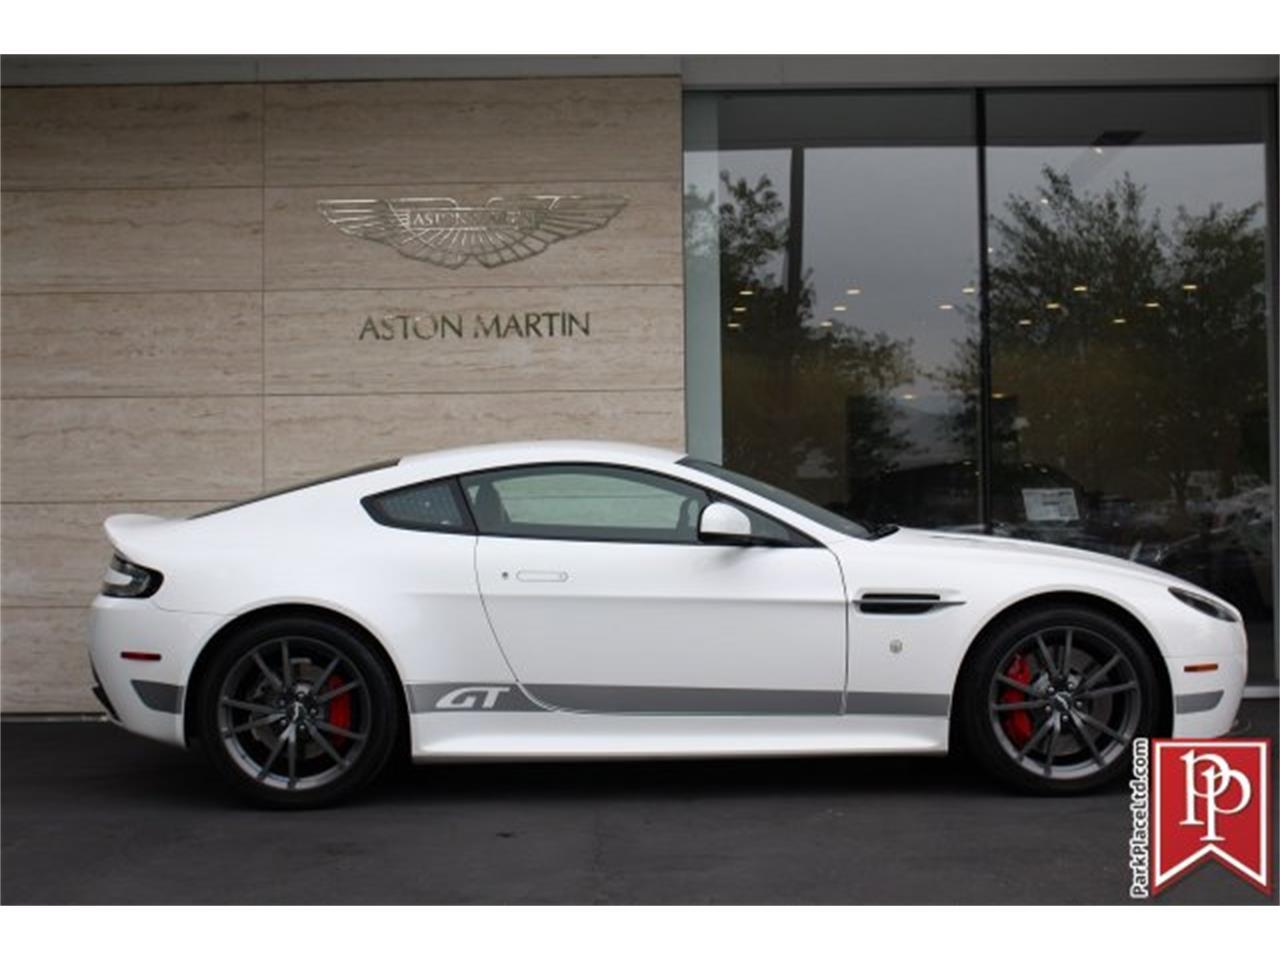 Aston Martin Vantage For Sale ClassicCarscom CC - Galpin aston martin inventory